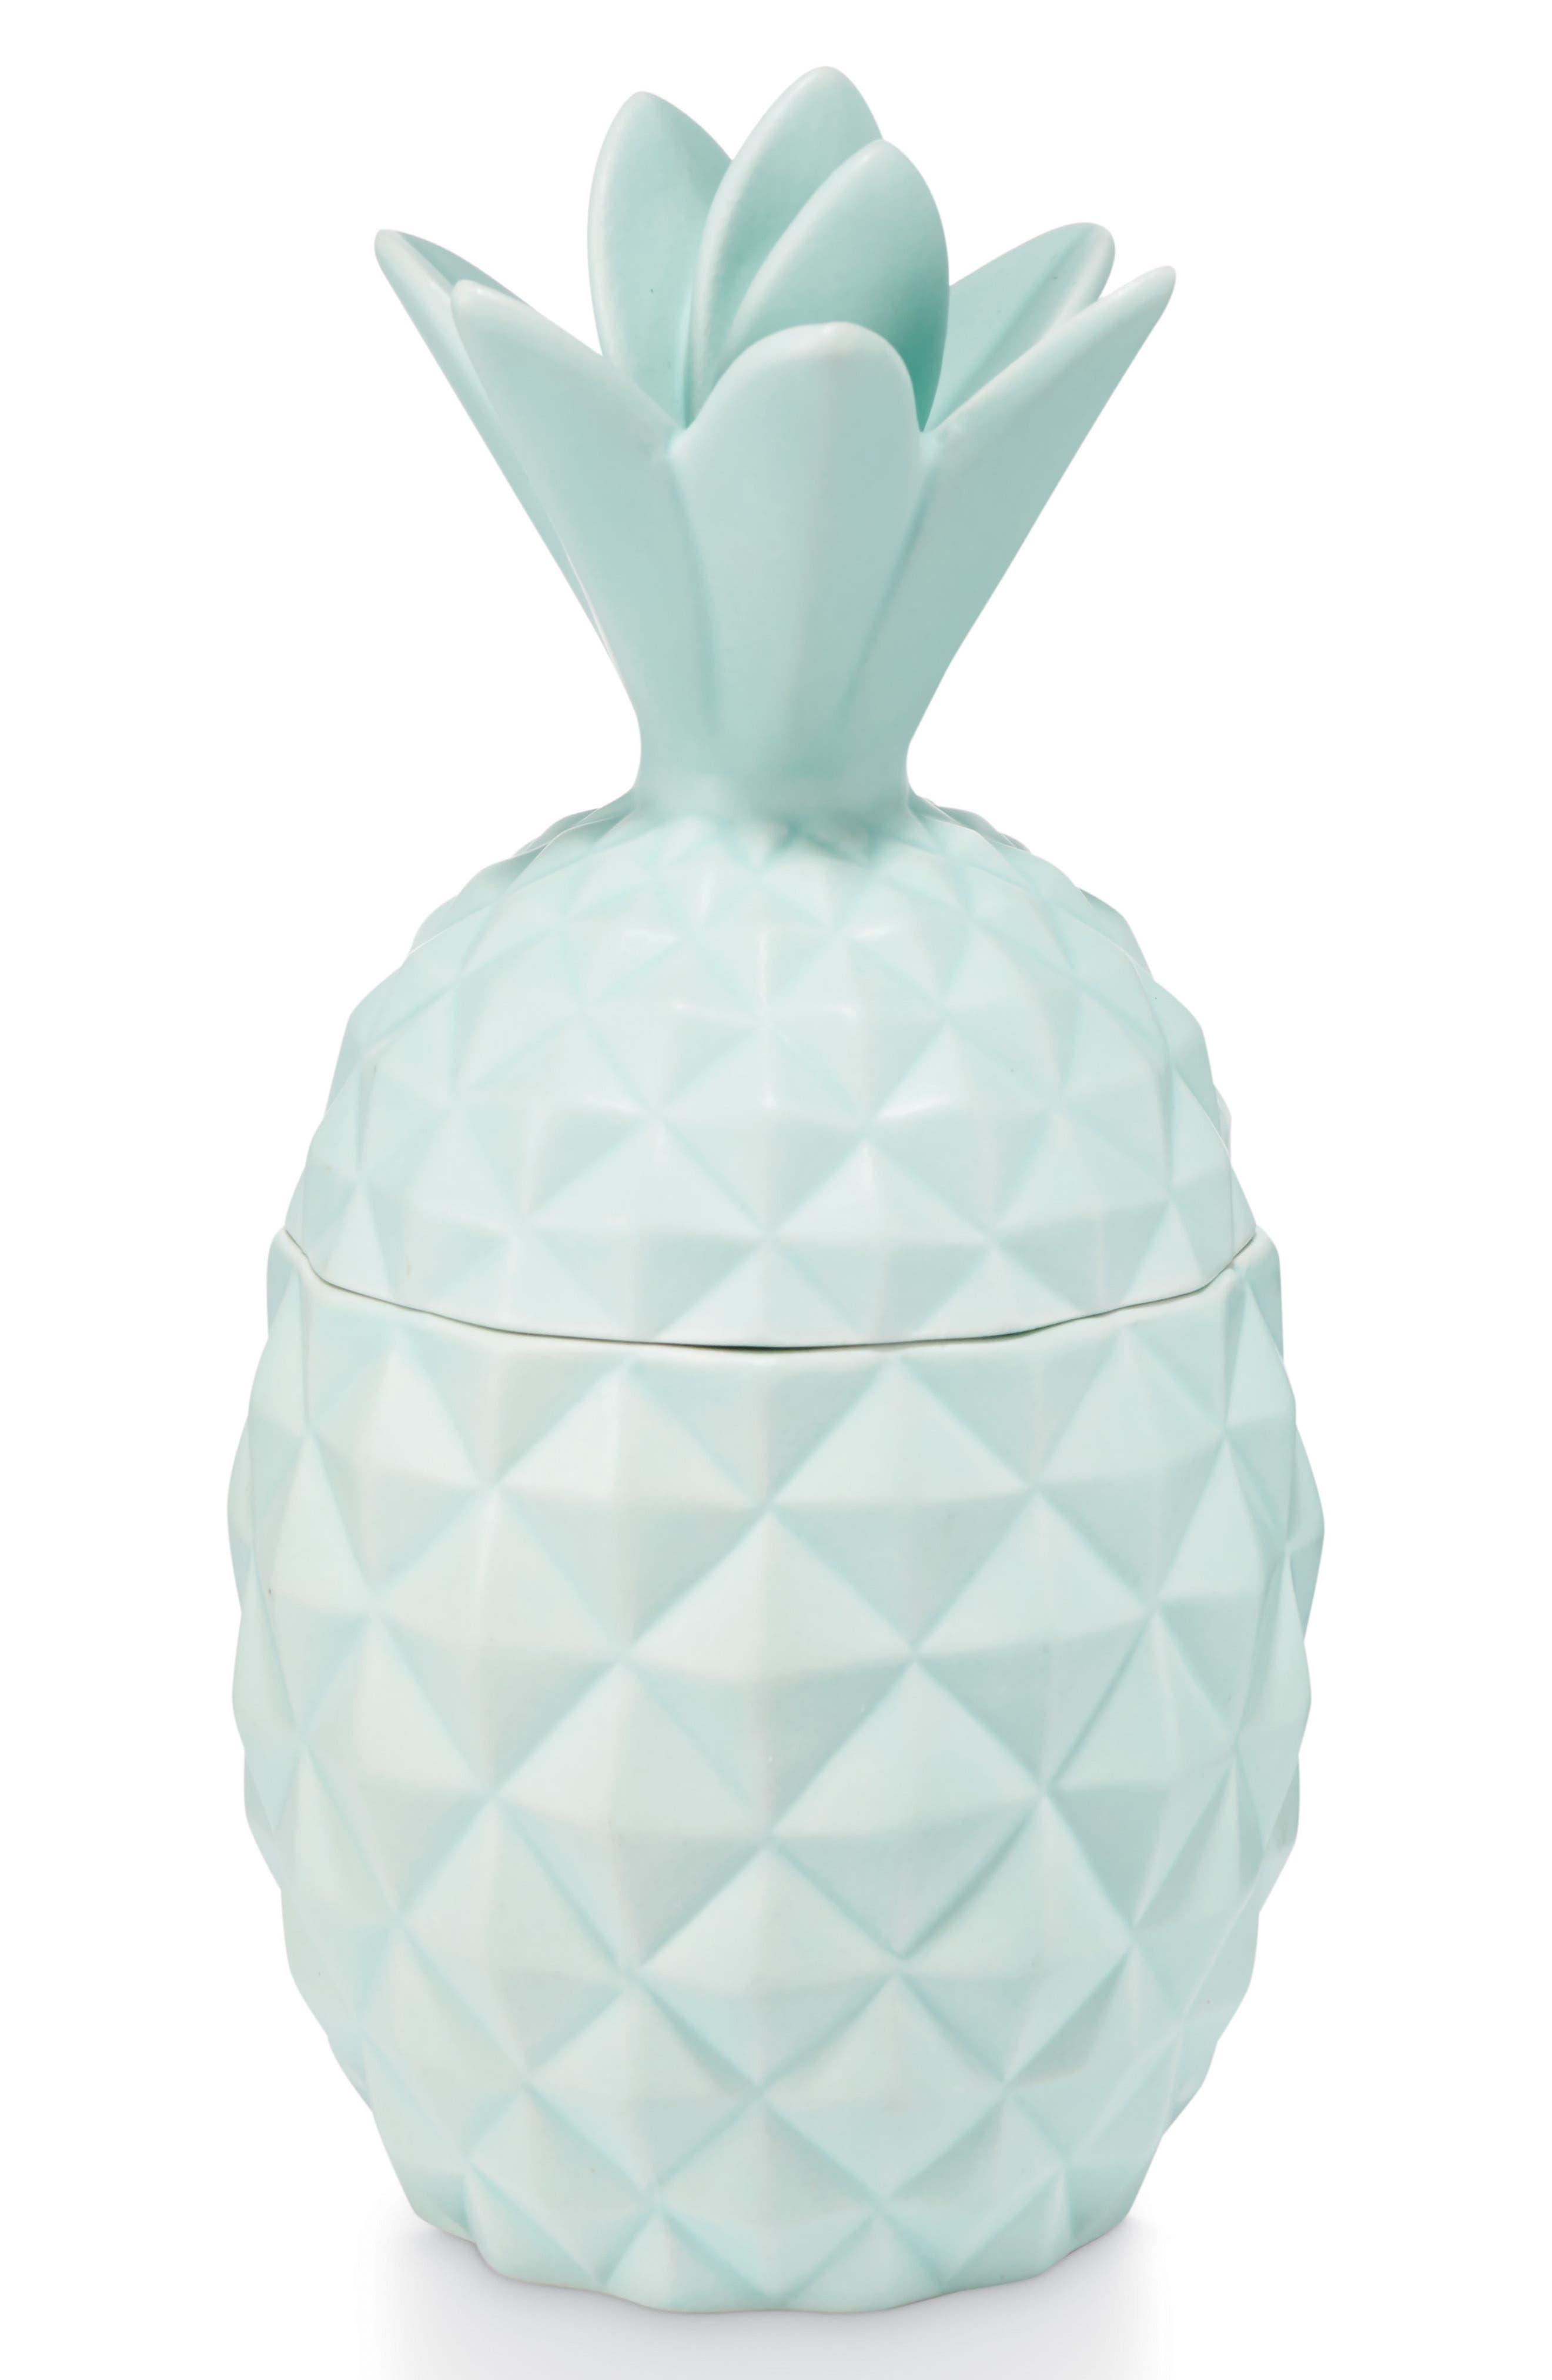 Ceramic Pineapple Jar Candle,                             Main thumbnail 1, color,                             Sugared Blossom